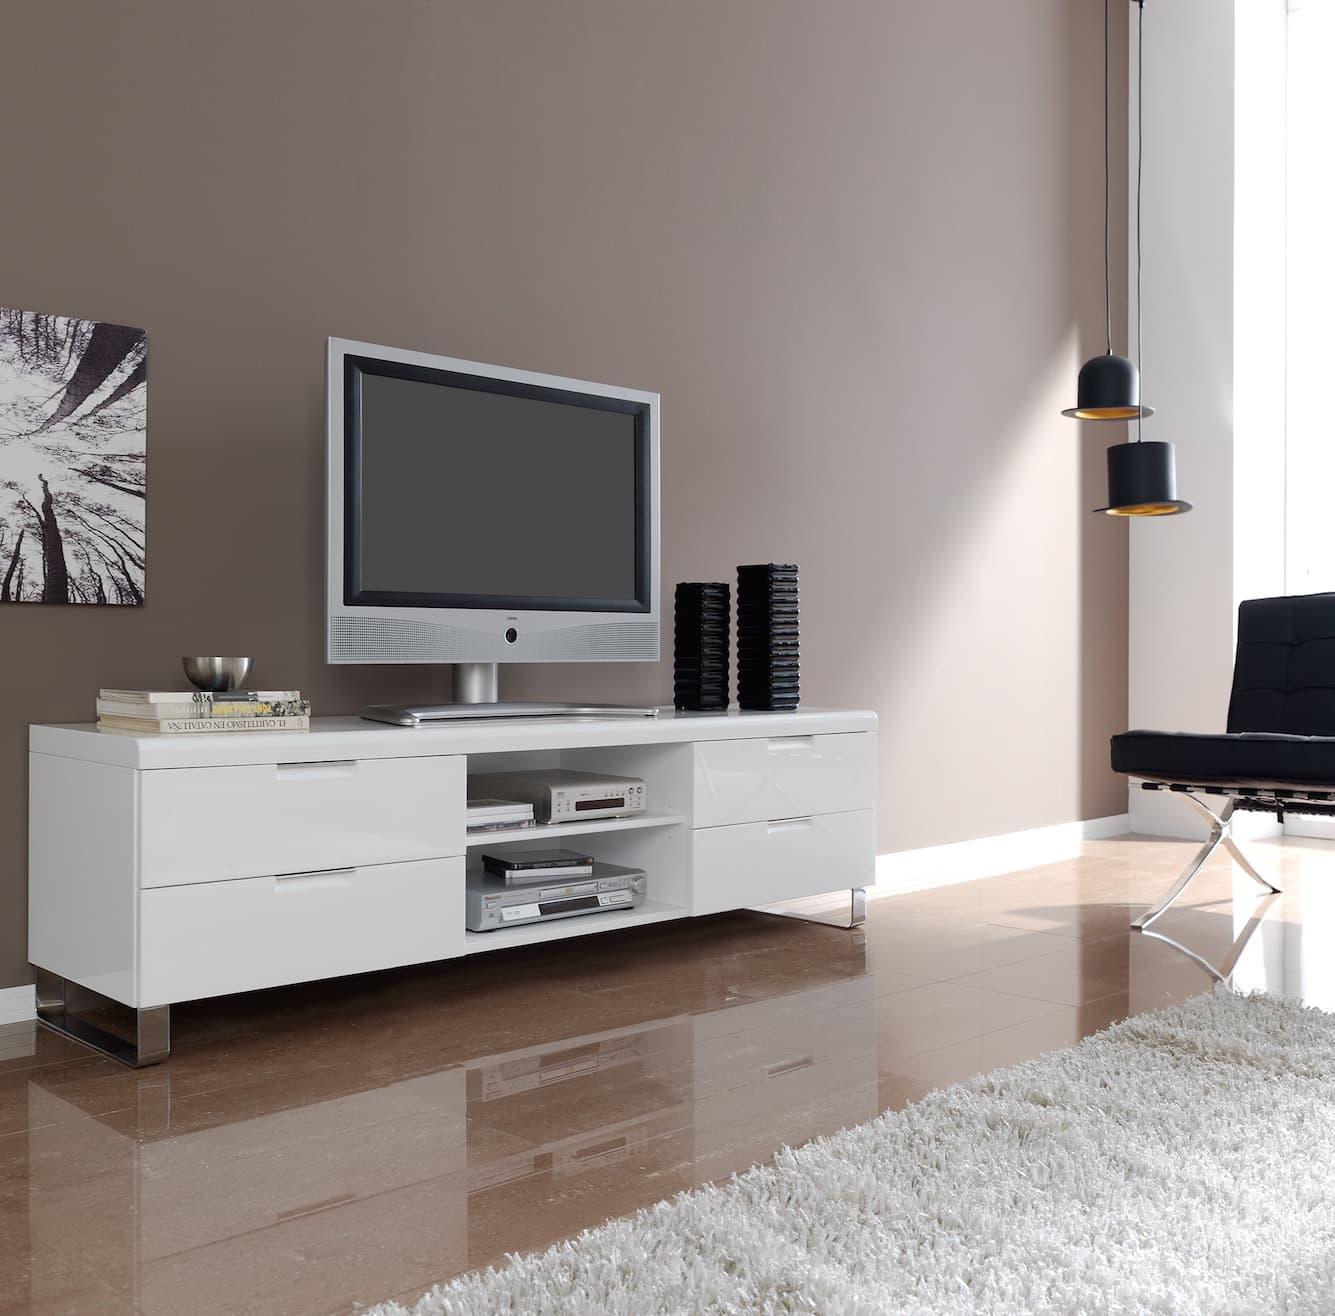 Meuble Tv A La Mode Fenrez Com Sammlung Von Design Zeichnungen  # Meuble Tv A La Mode